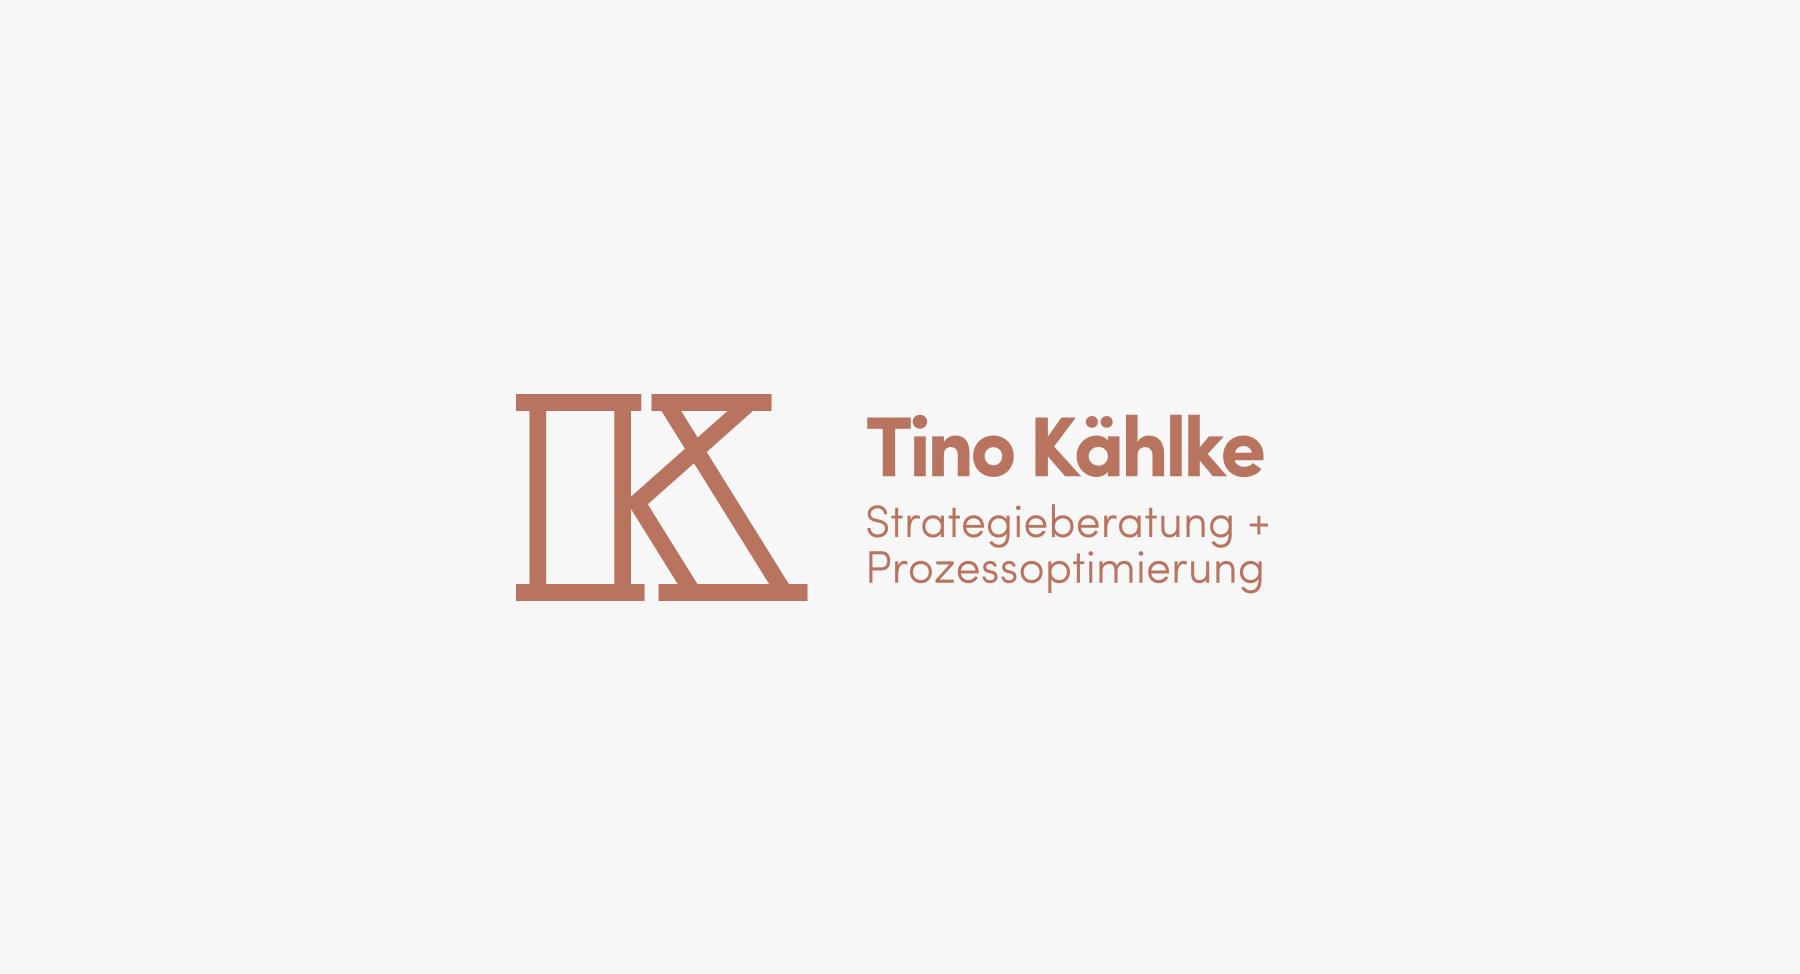 logo-tino-kaehlke-buero-ink-grafikdesign-02